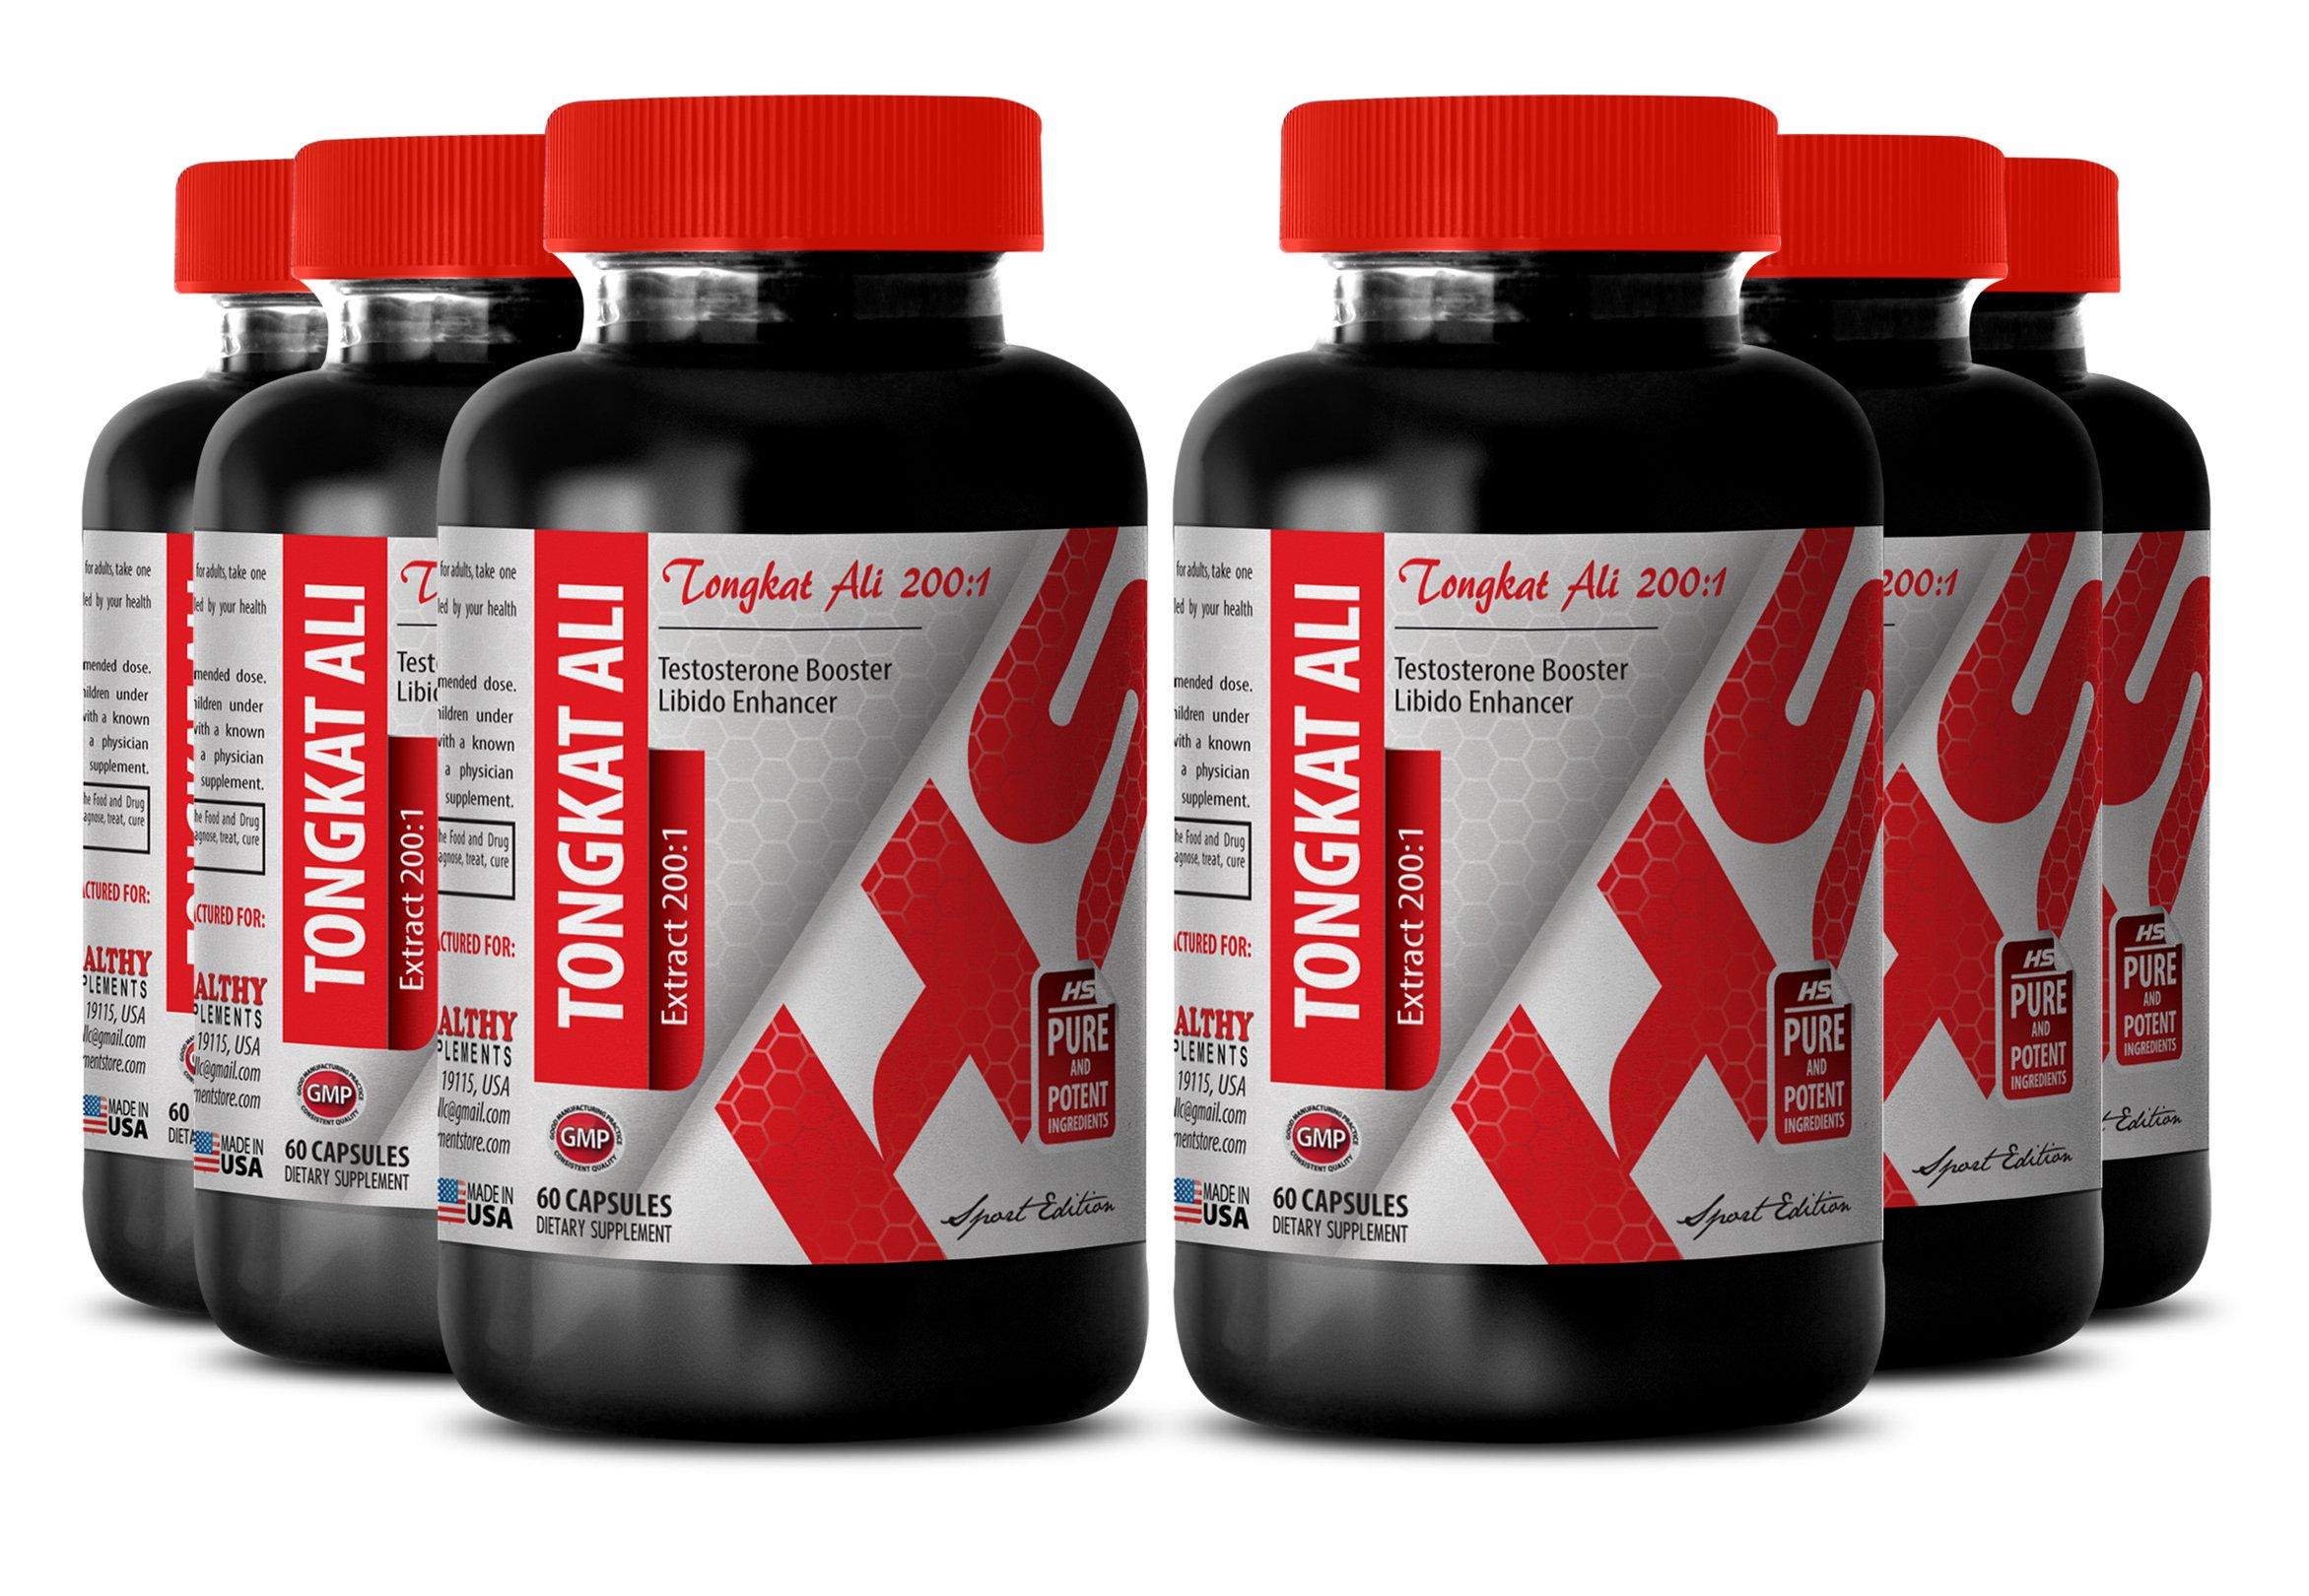 Tongkat ali organic powder - LONGJACK TONGKAT ALI EXTRACT 200 : 1 400 MG - improve sexual performance (6 Bottles)